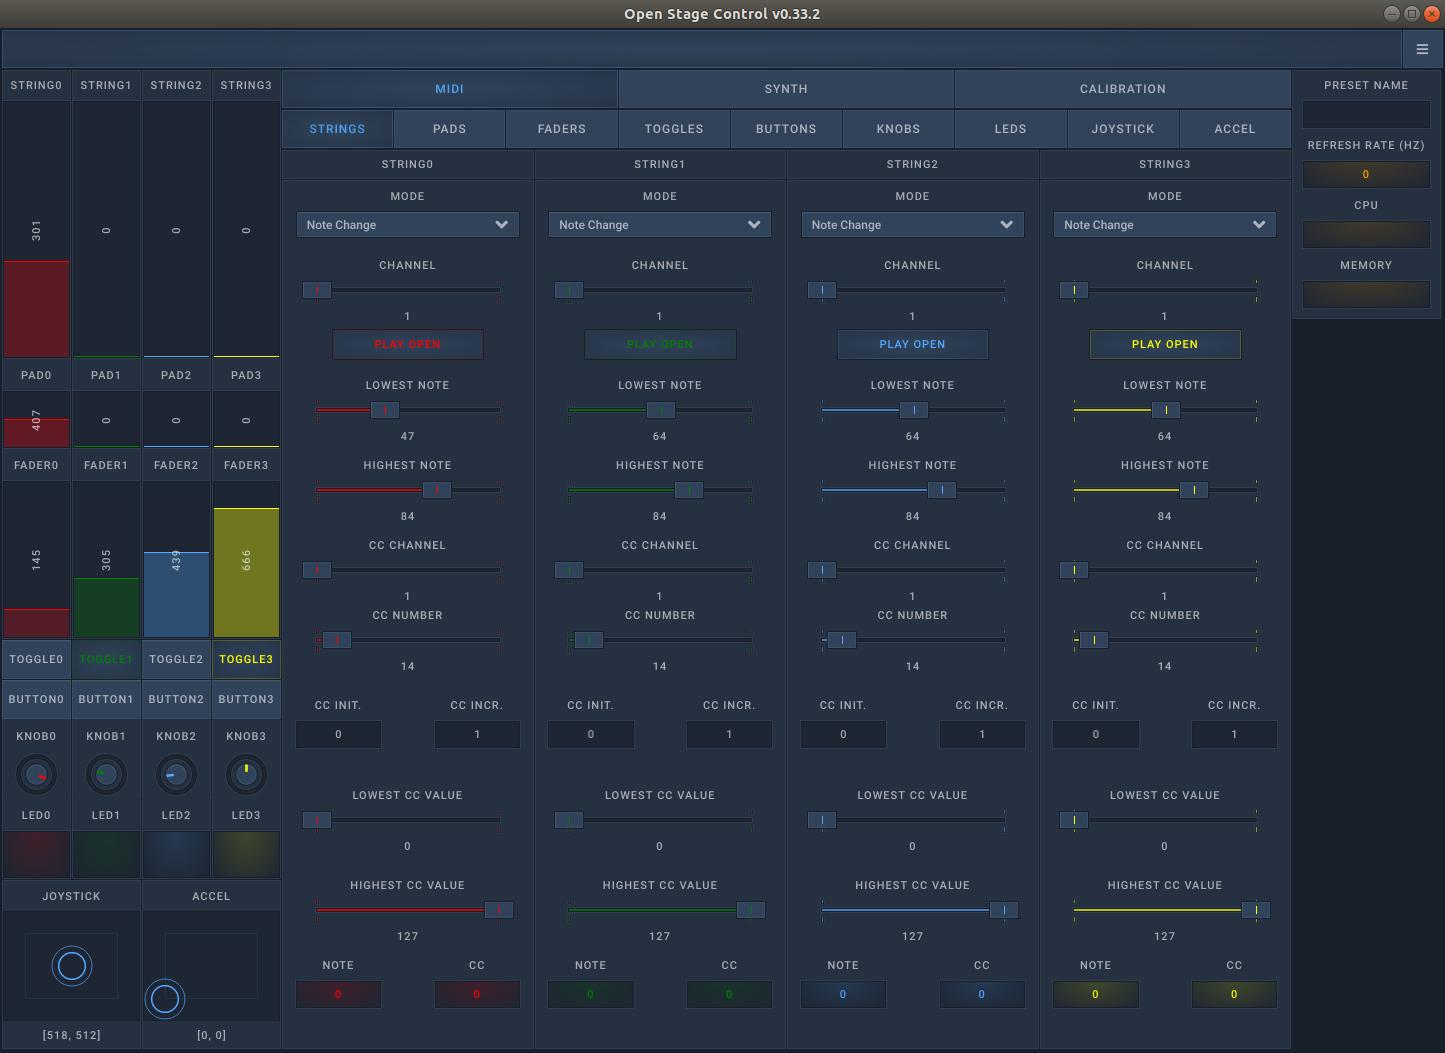 kxmx_ruitar - Body - Detail GUI